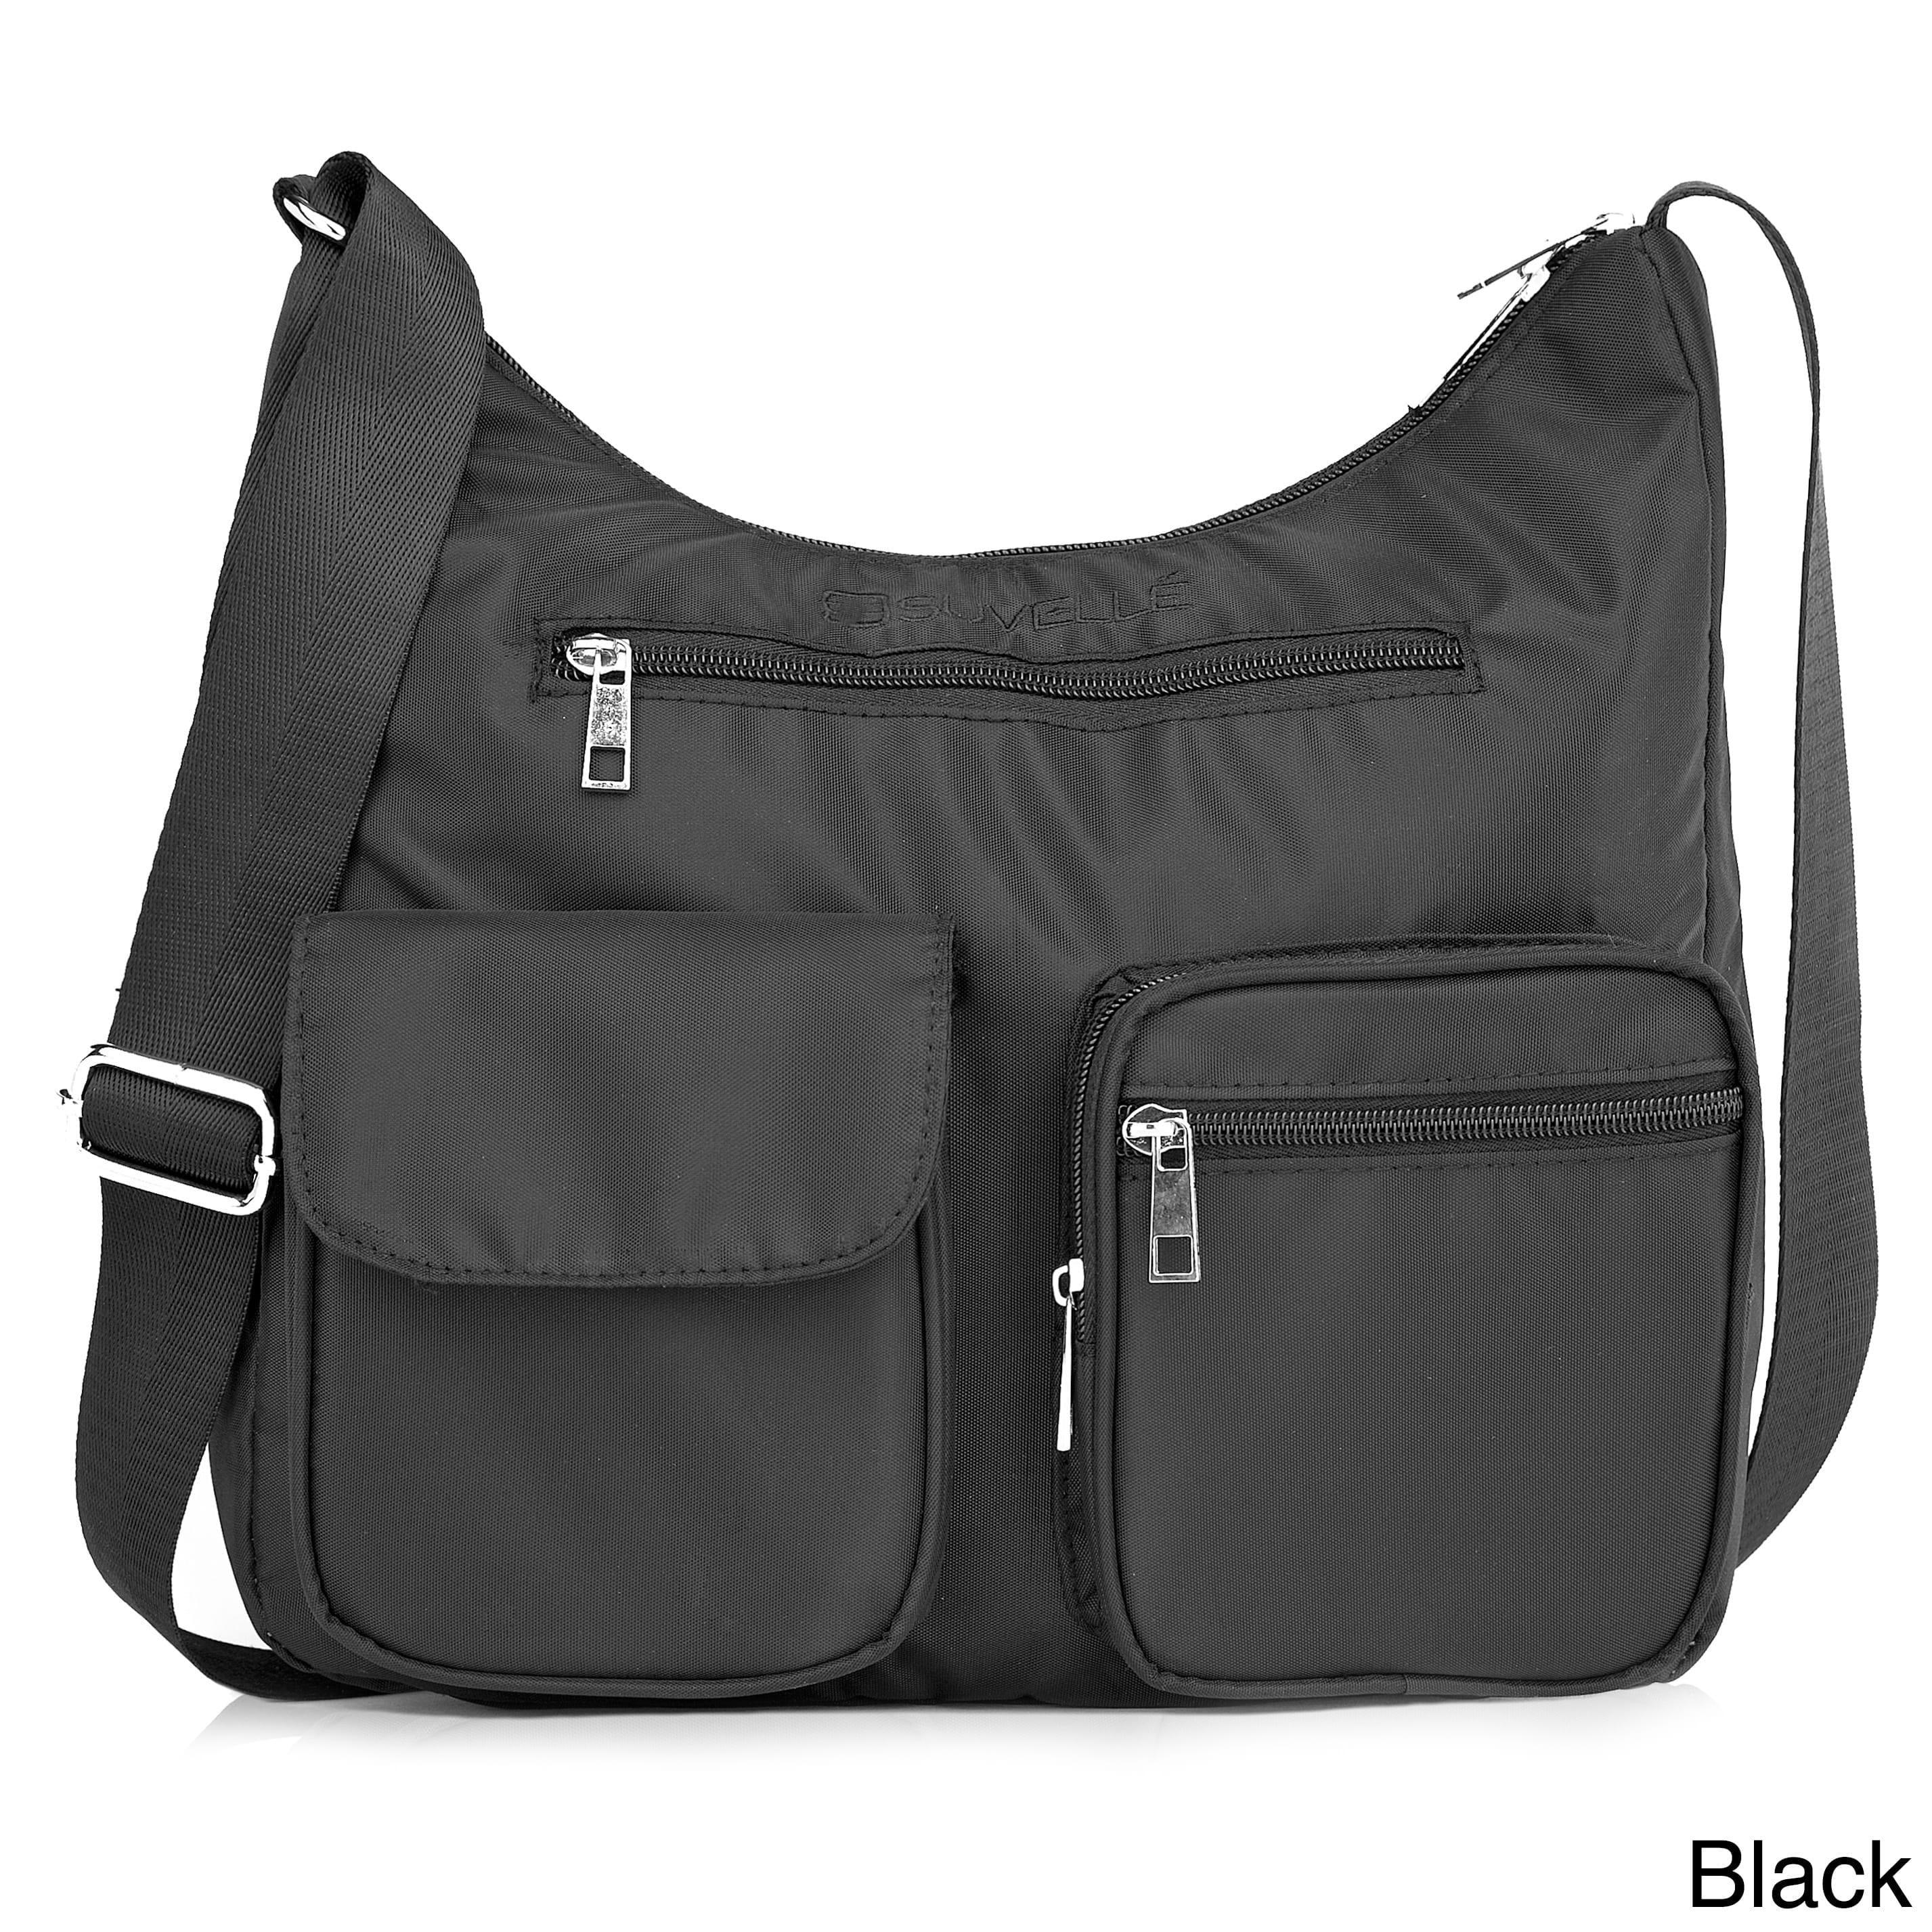 Buy Fabric Shoulder Bags Online at Overstock  b6f8d5cd51ef9